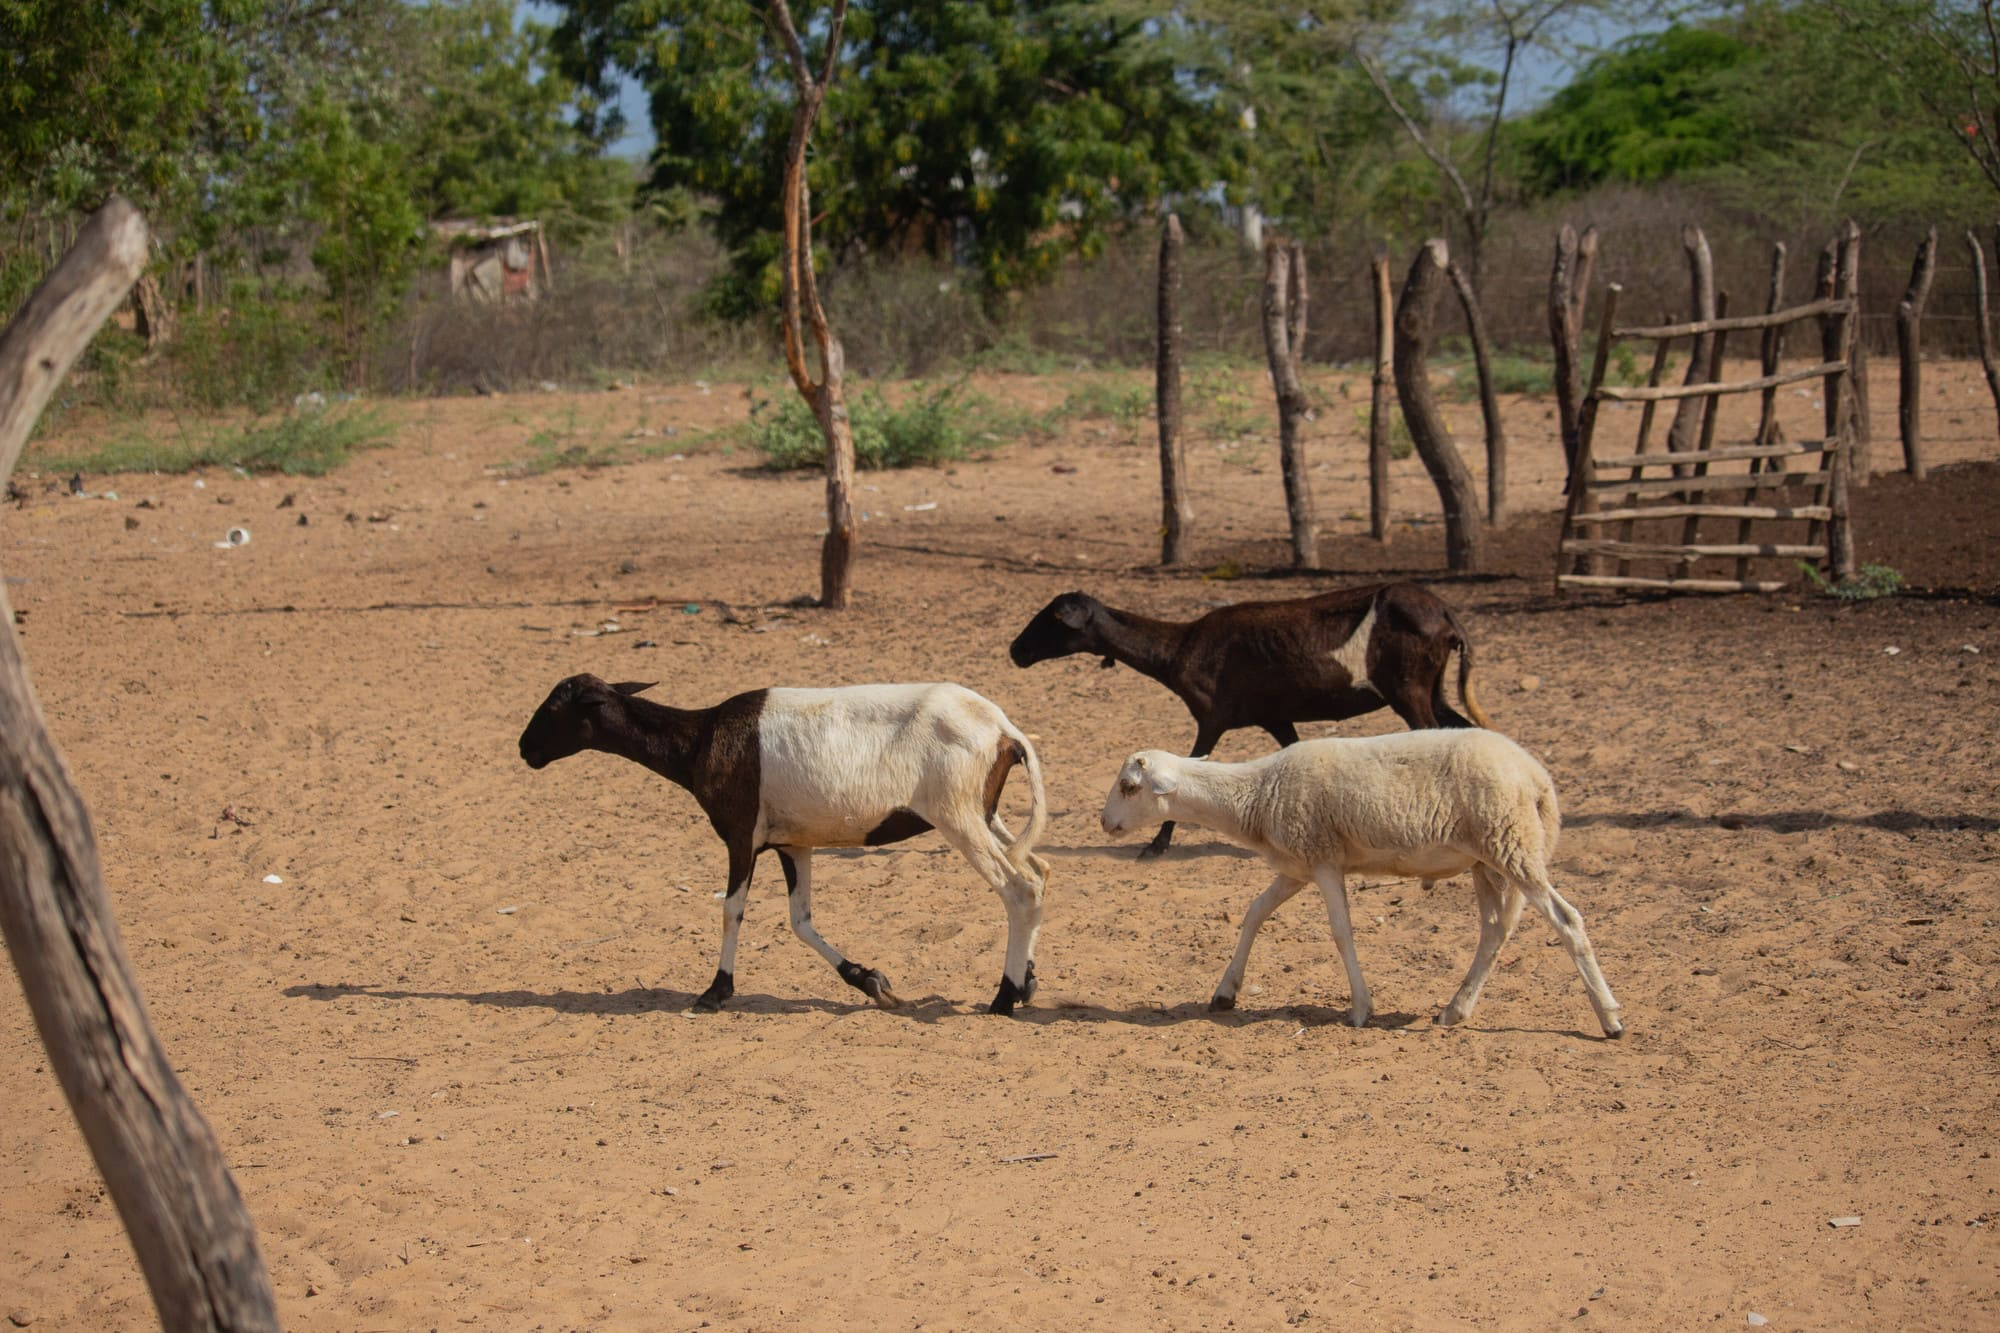 Wayuu goats. Goats in a ranchería